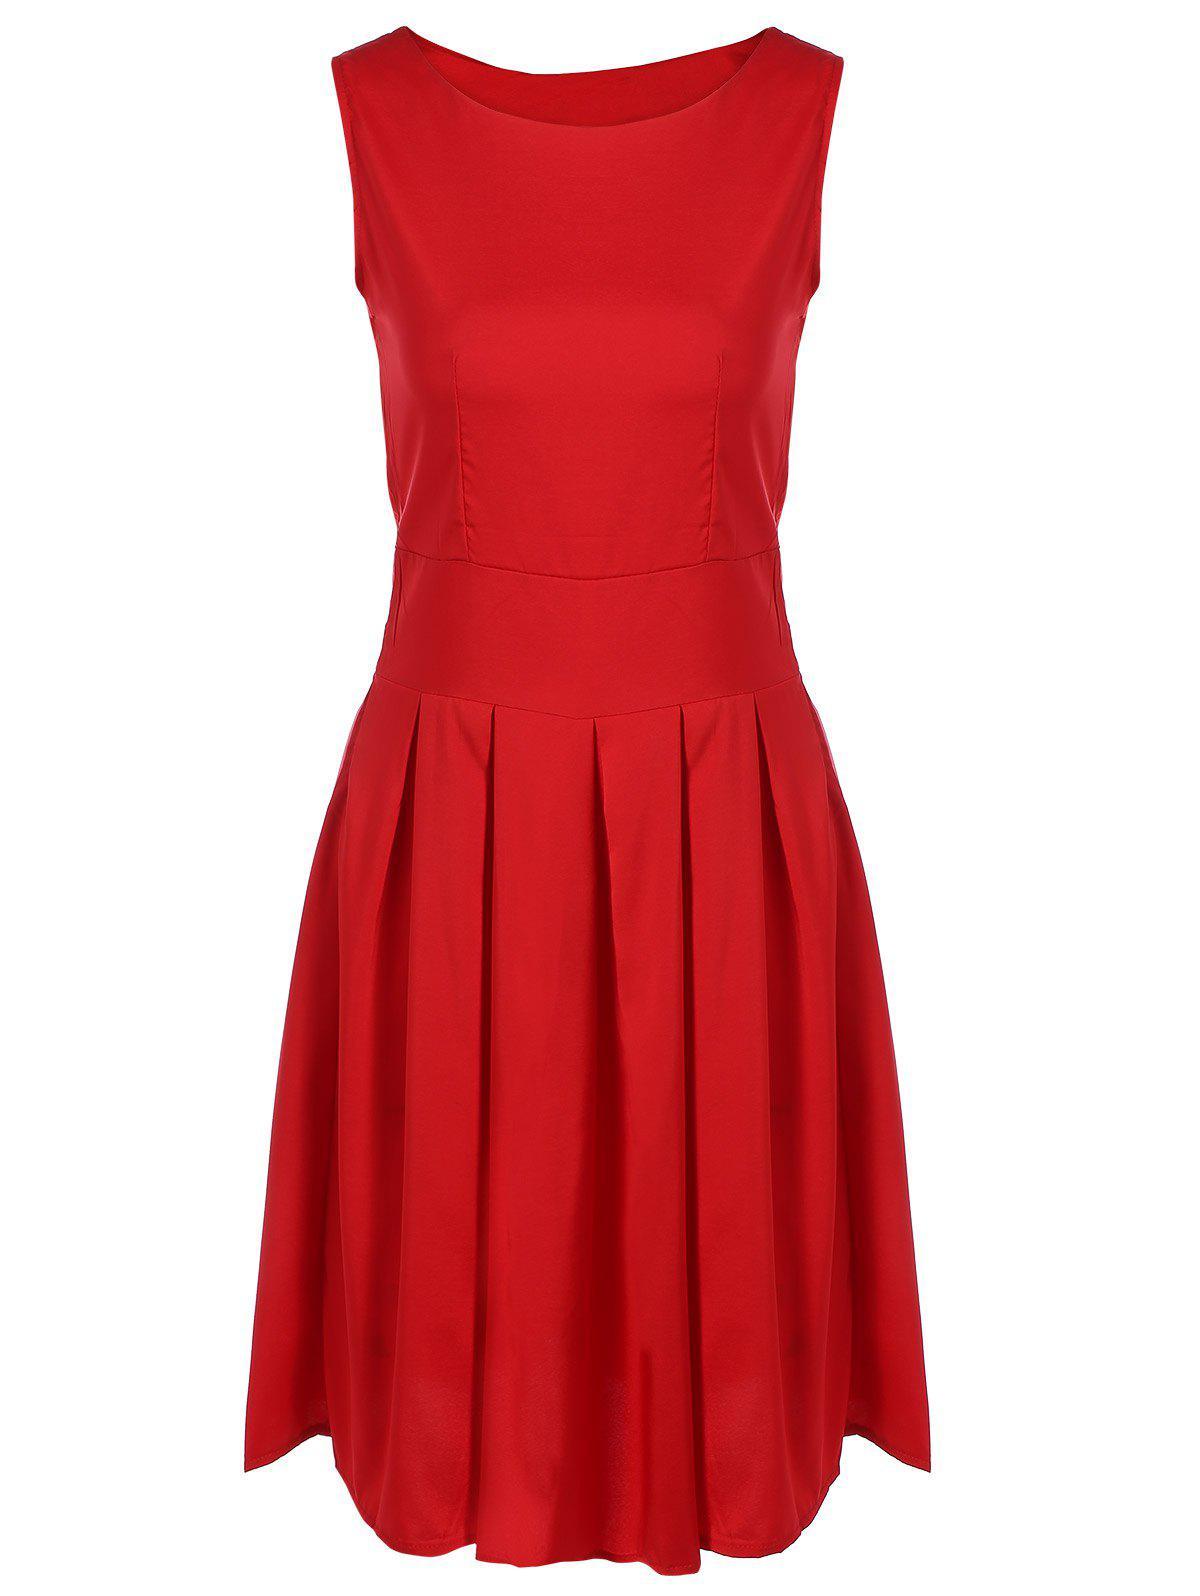 Vintage Swing Dresses